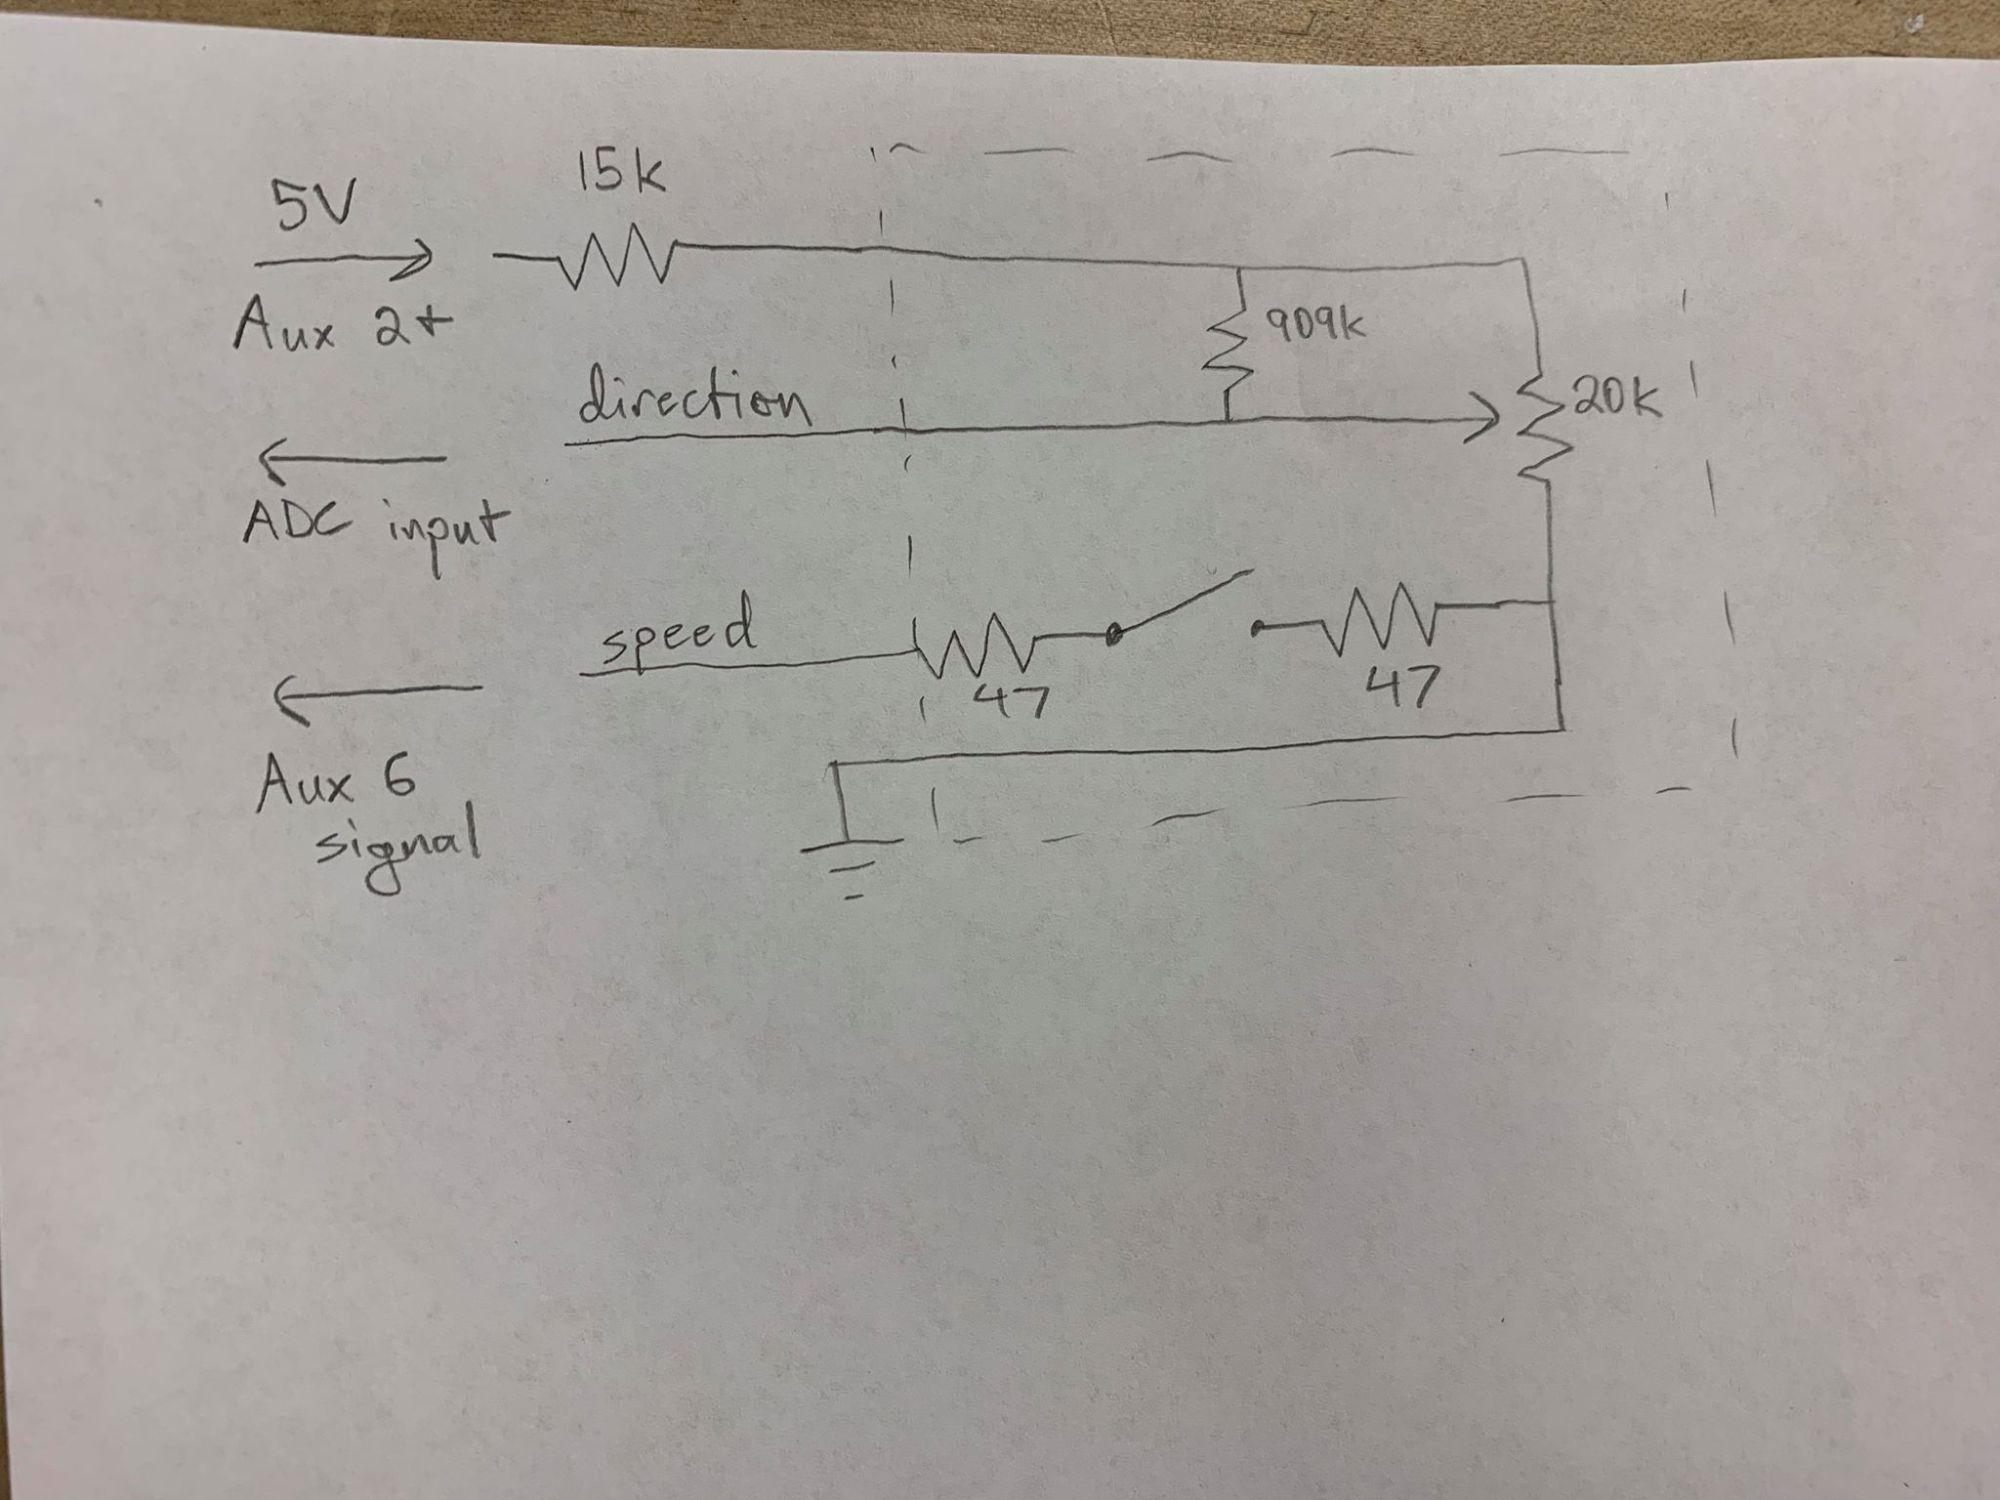 hight resolution of wiring diagram jpg2048 1536 247 kb